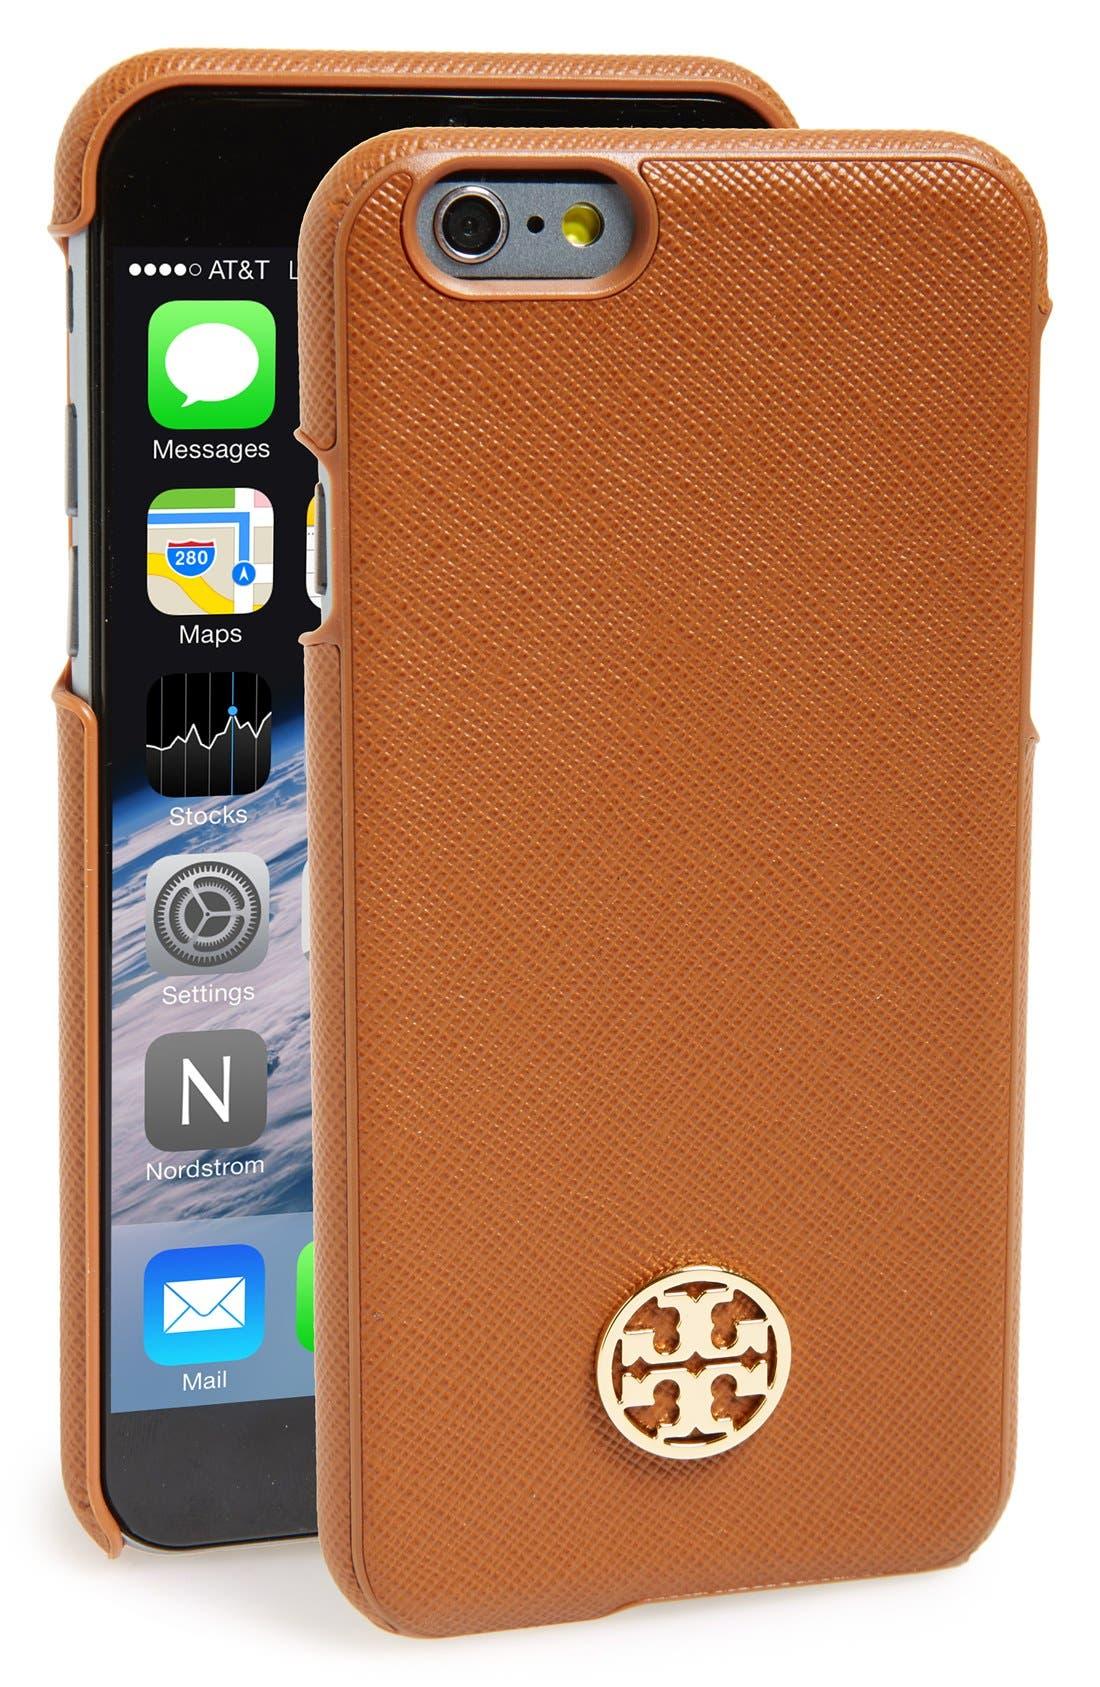 Main Image - Tory Burch 'Robinson' Saffiano Leather iPhone 6 Case